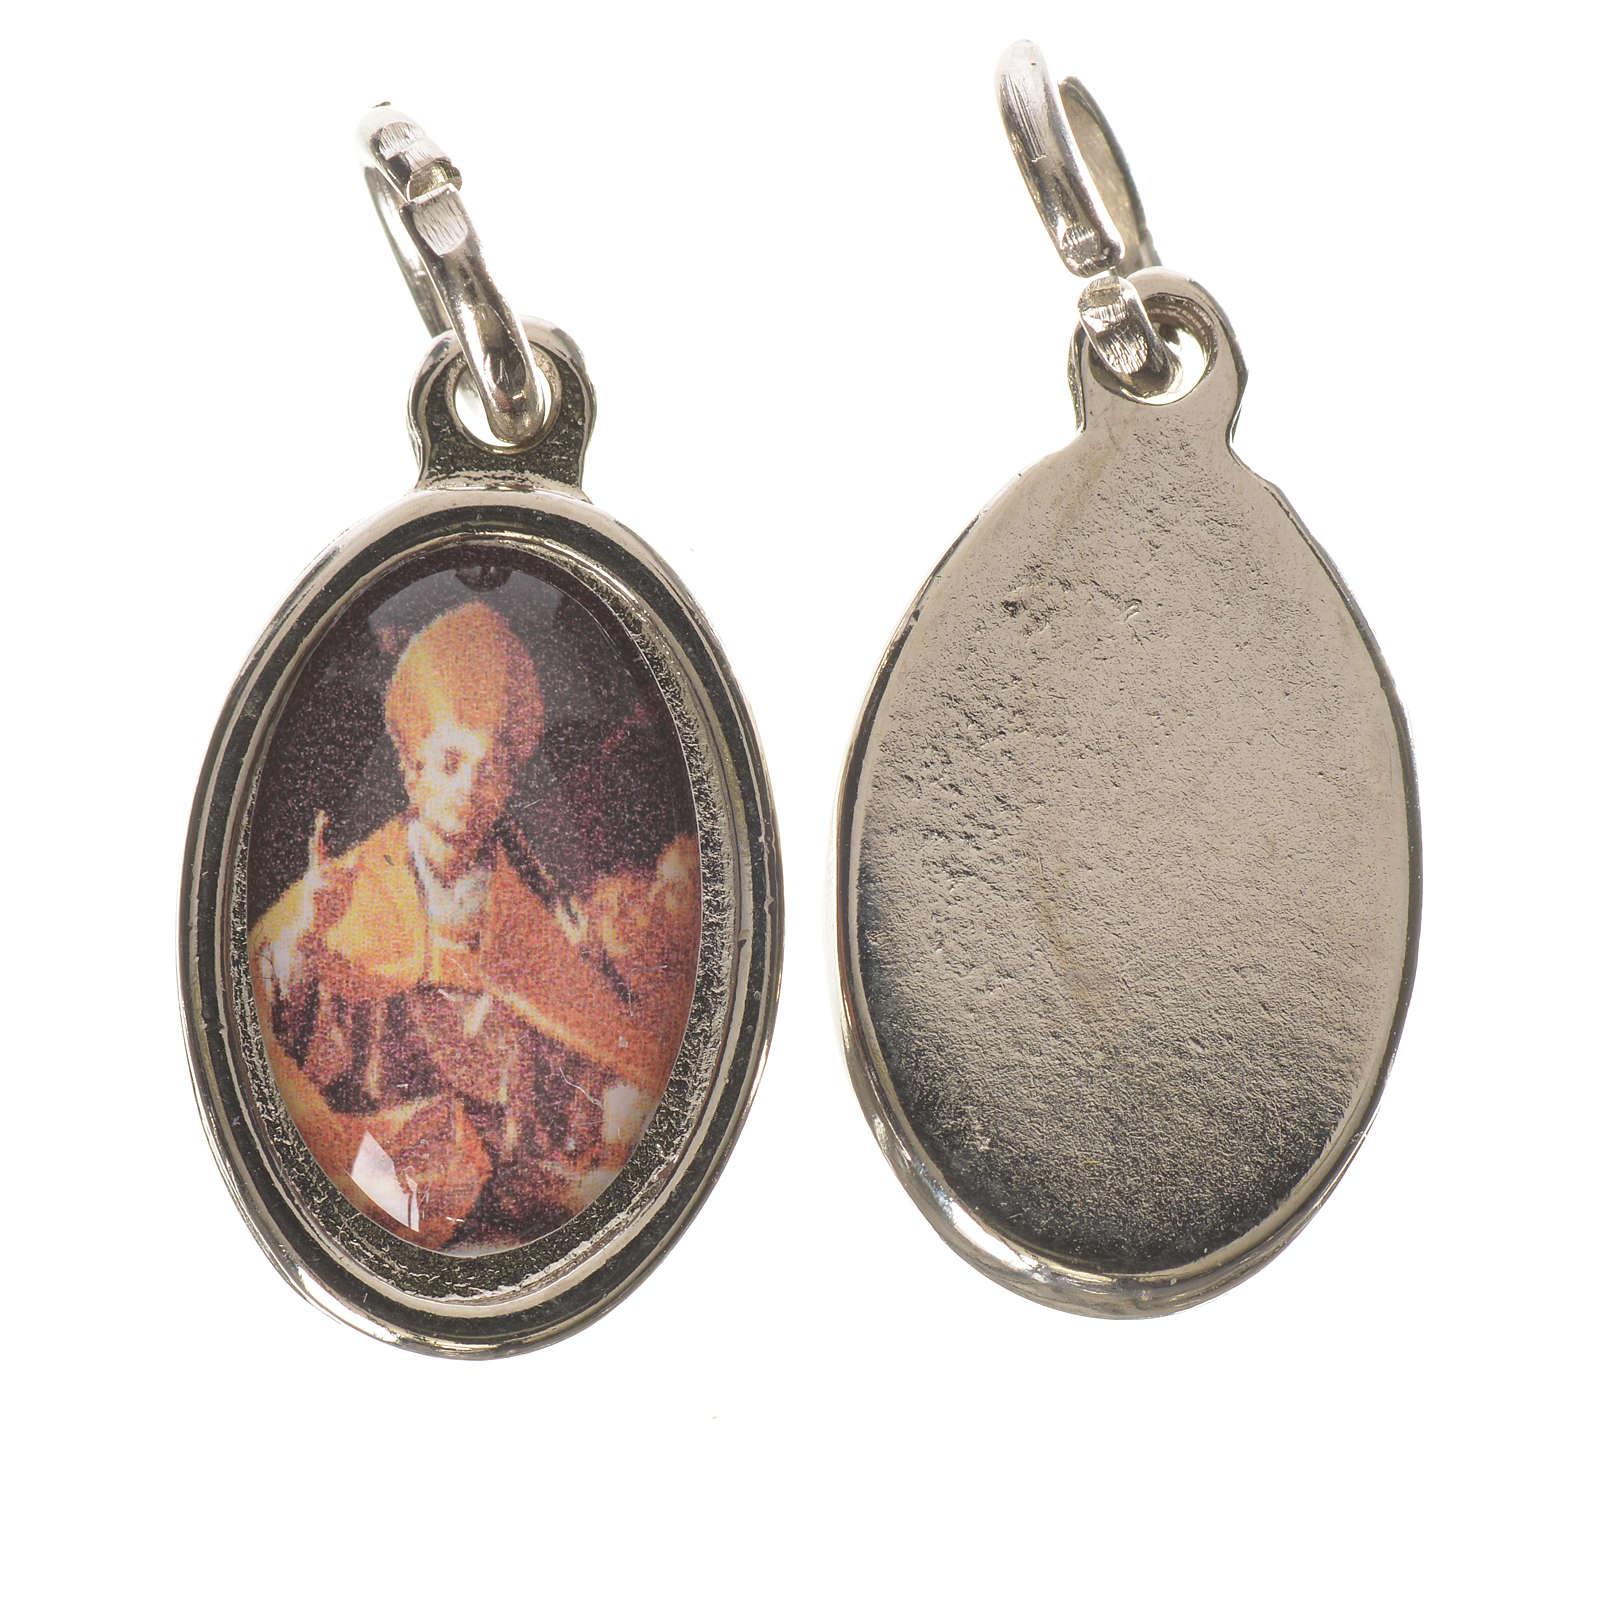 Saint Charles Borromeo medal in silver metal, 1.5cm 4